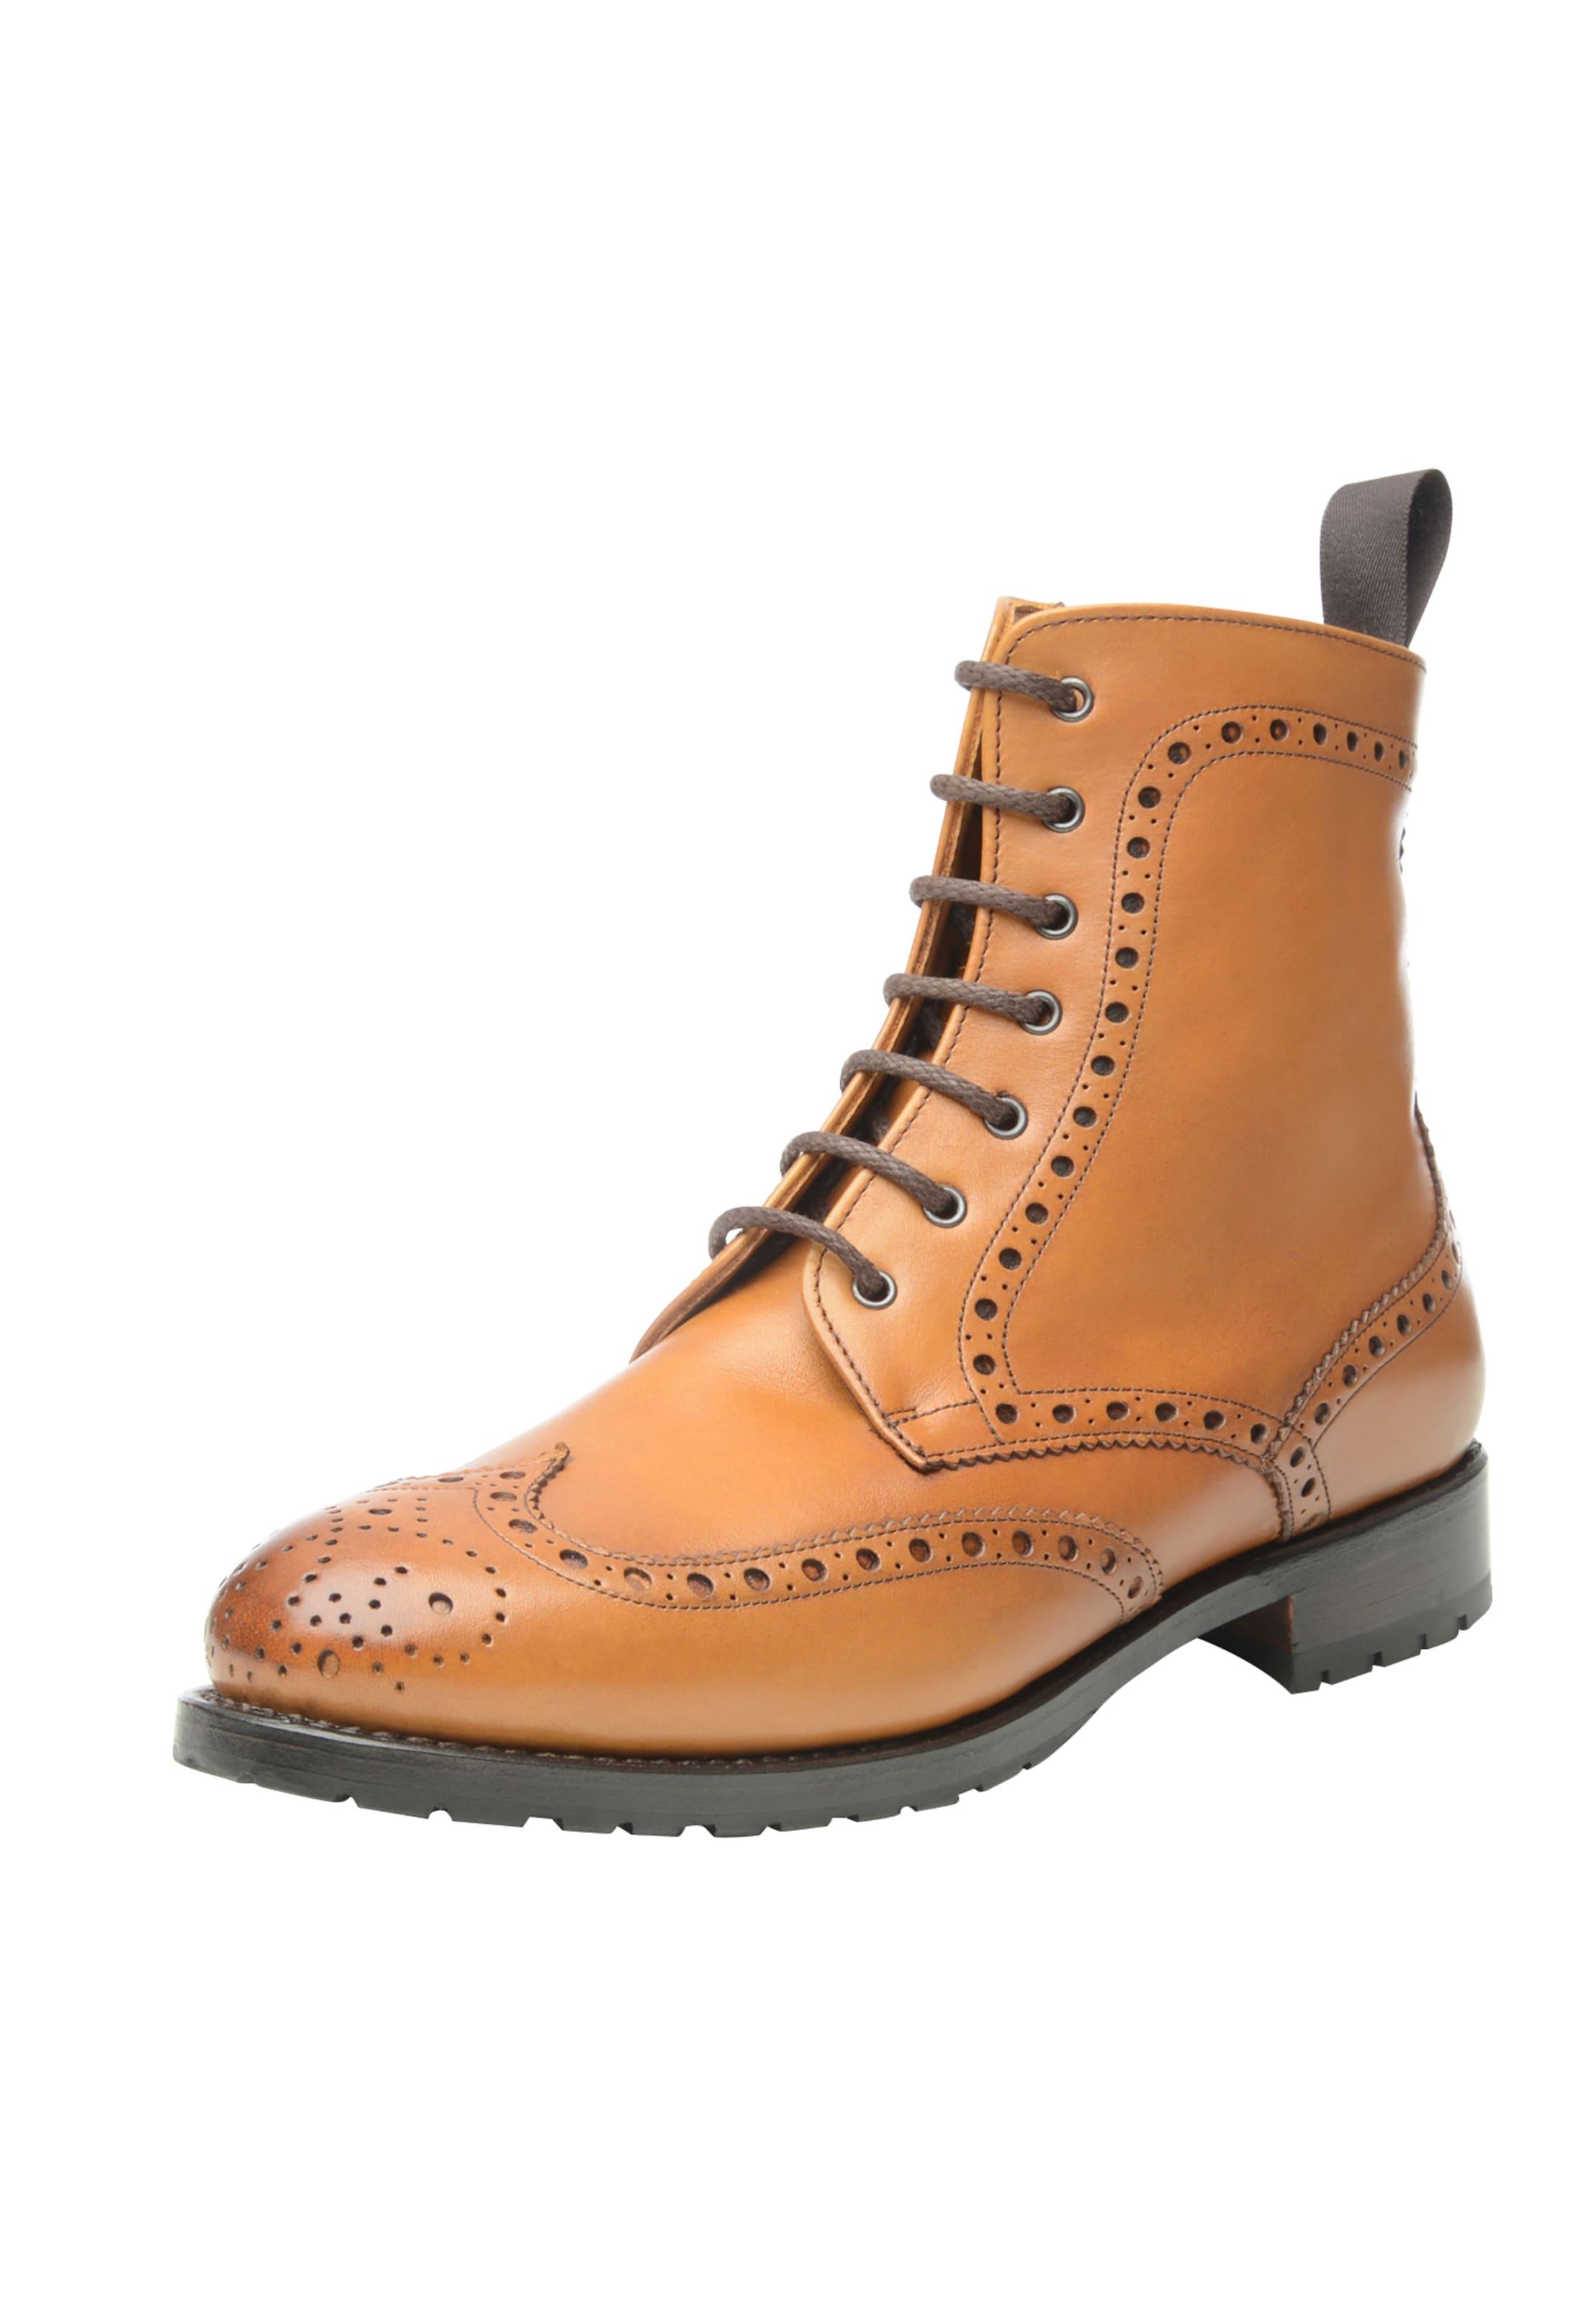 Haltbare Mode billige Schuhe SHOEPASSION | Winterboots 'No. 272' Schuhe Gut getragene Schuhe